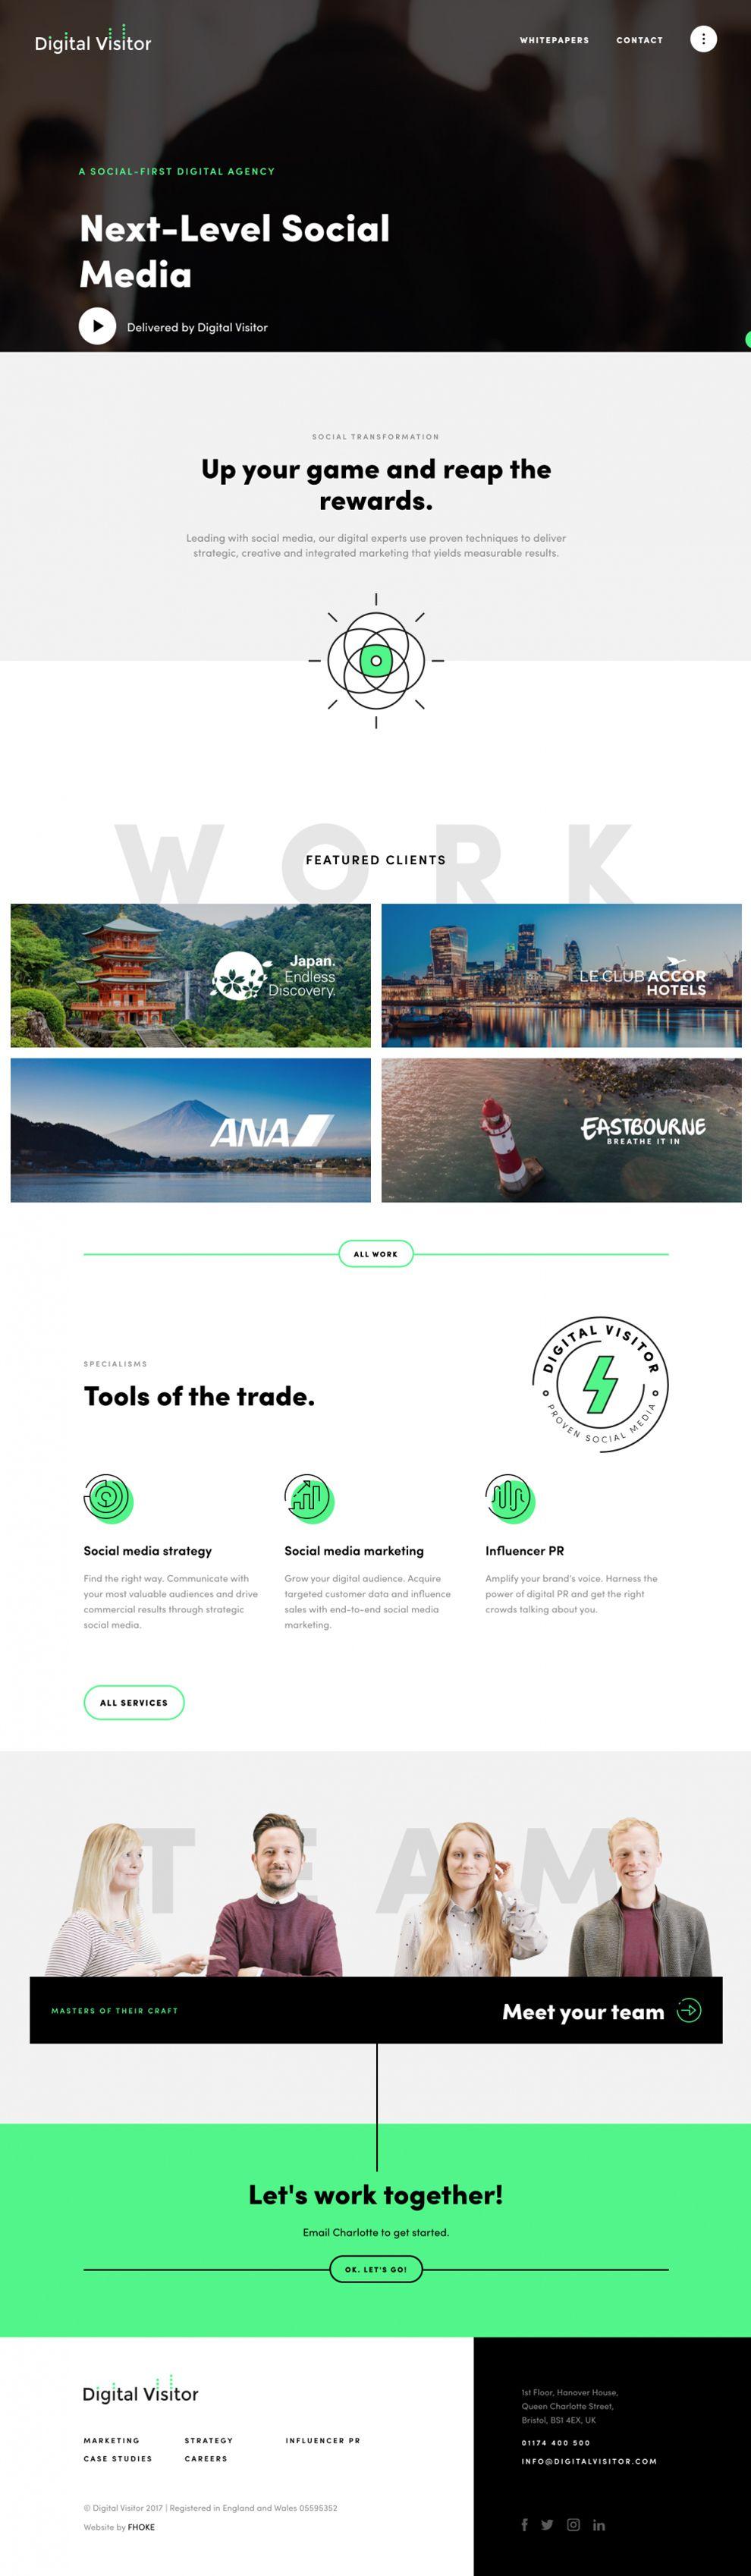 Digital Visitor Amazing Homepage